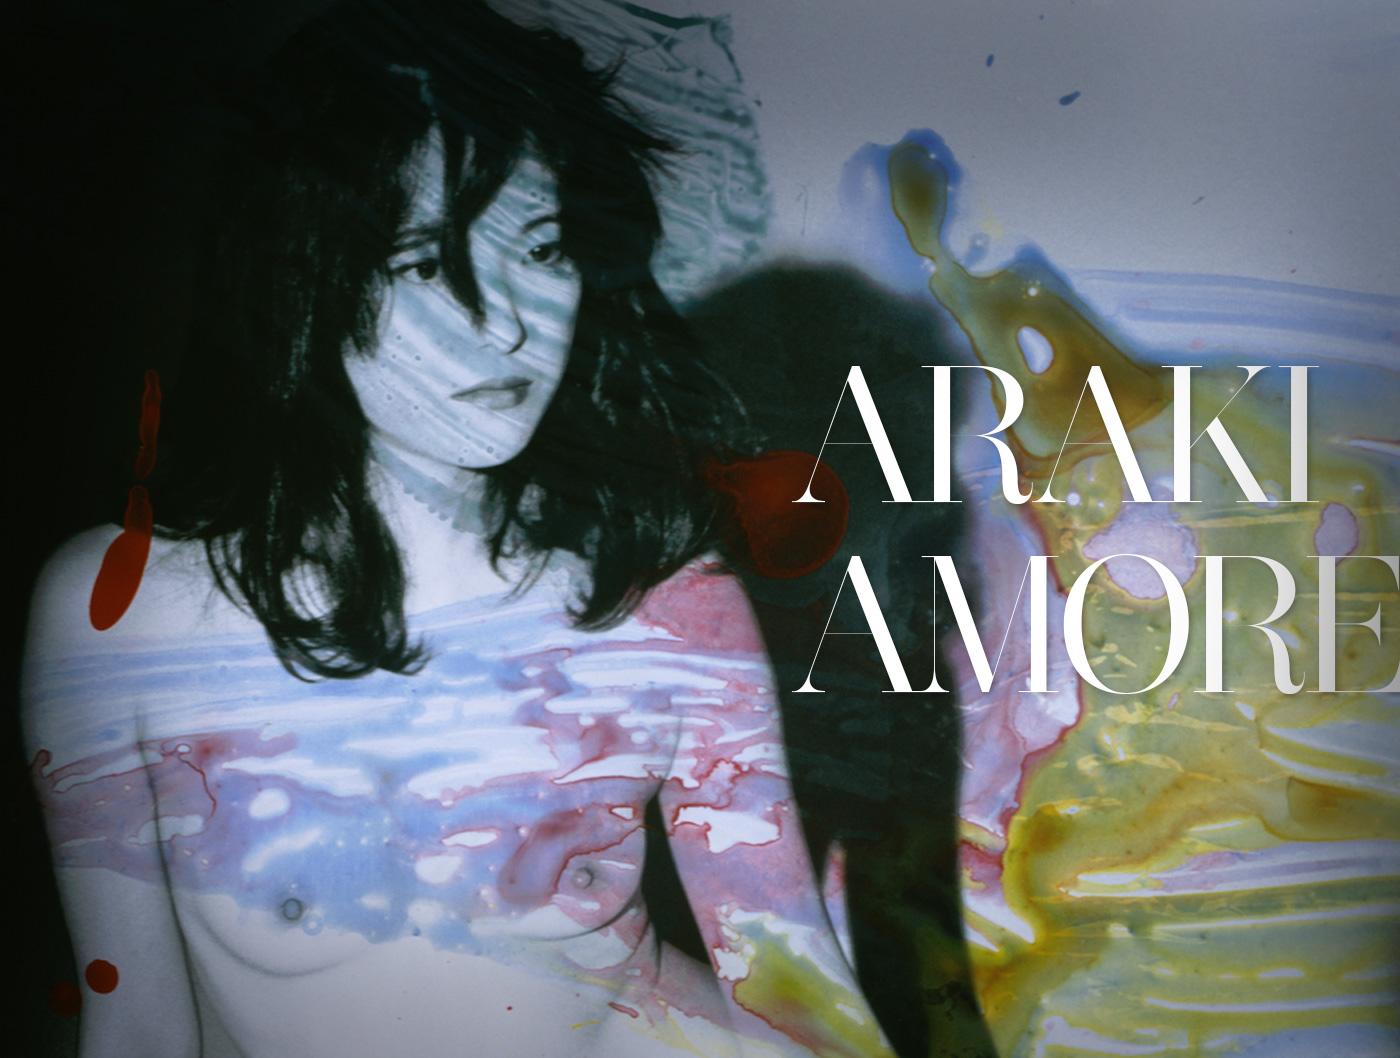 araki-amore-copertina